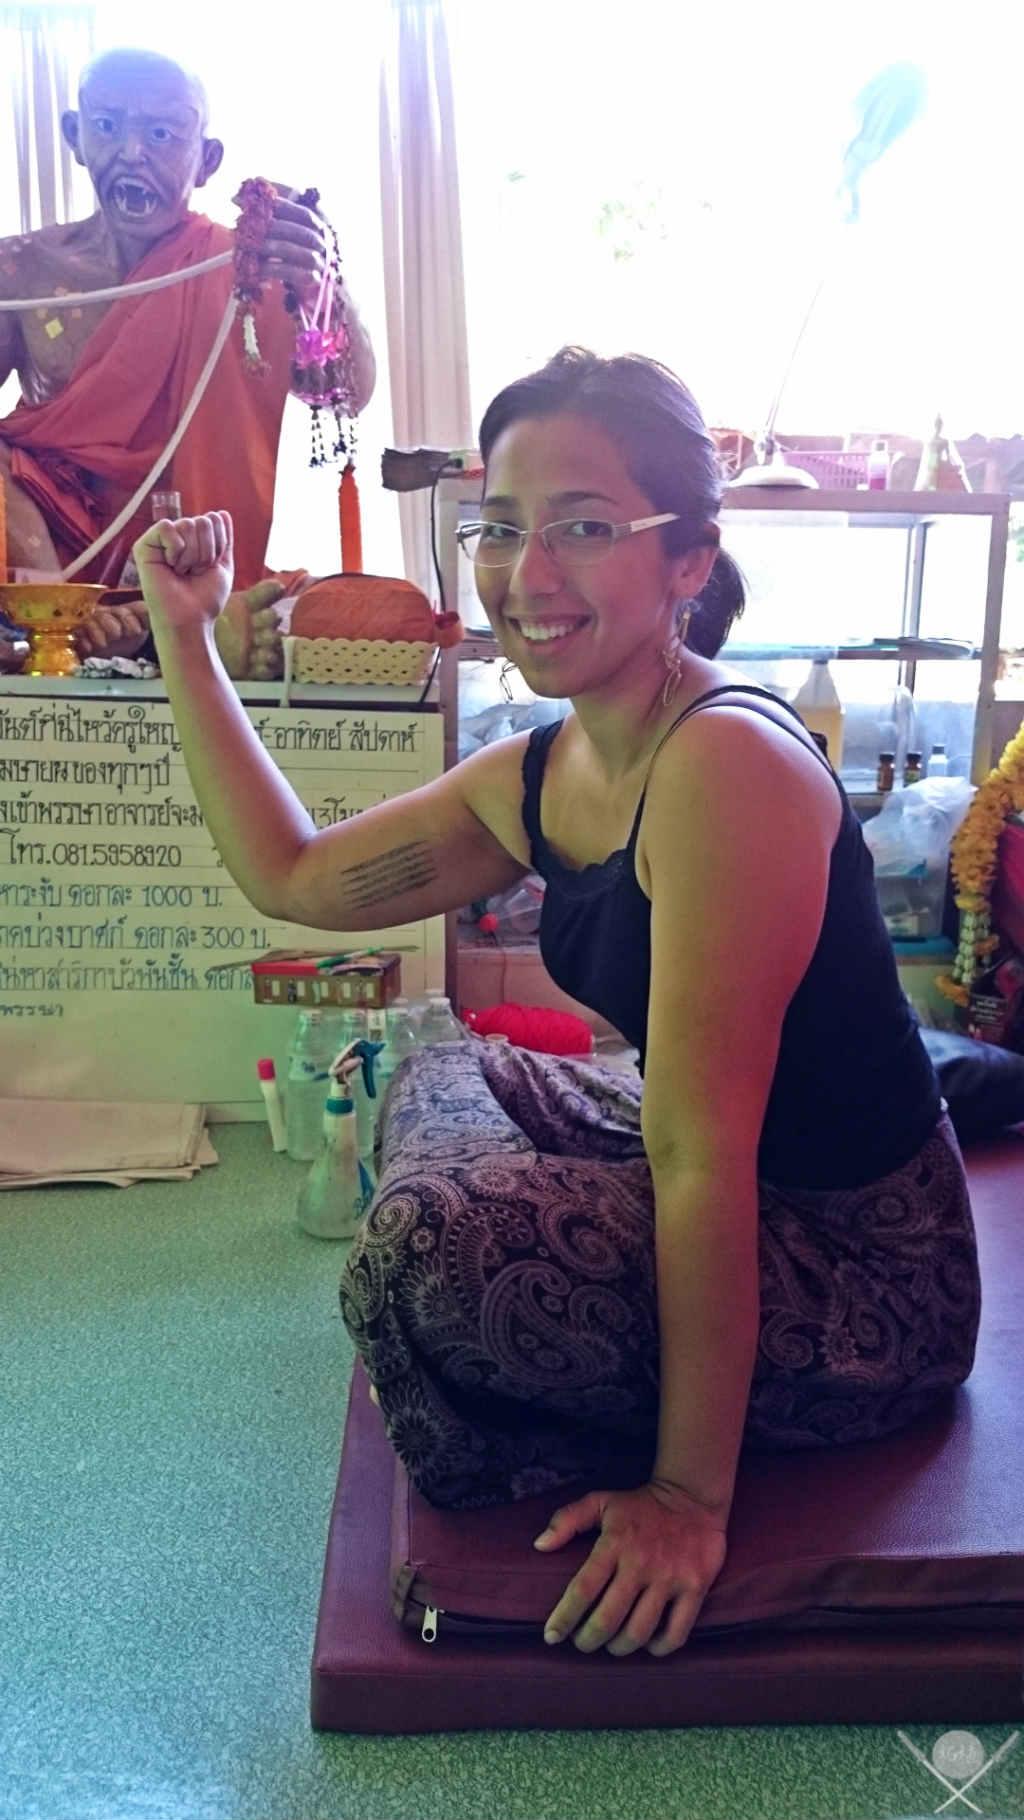 Thailand - Chiang Mai - Tattoo 1 - Viagens - Vida de Tsuge - VDT